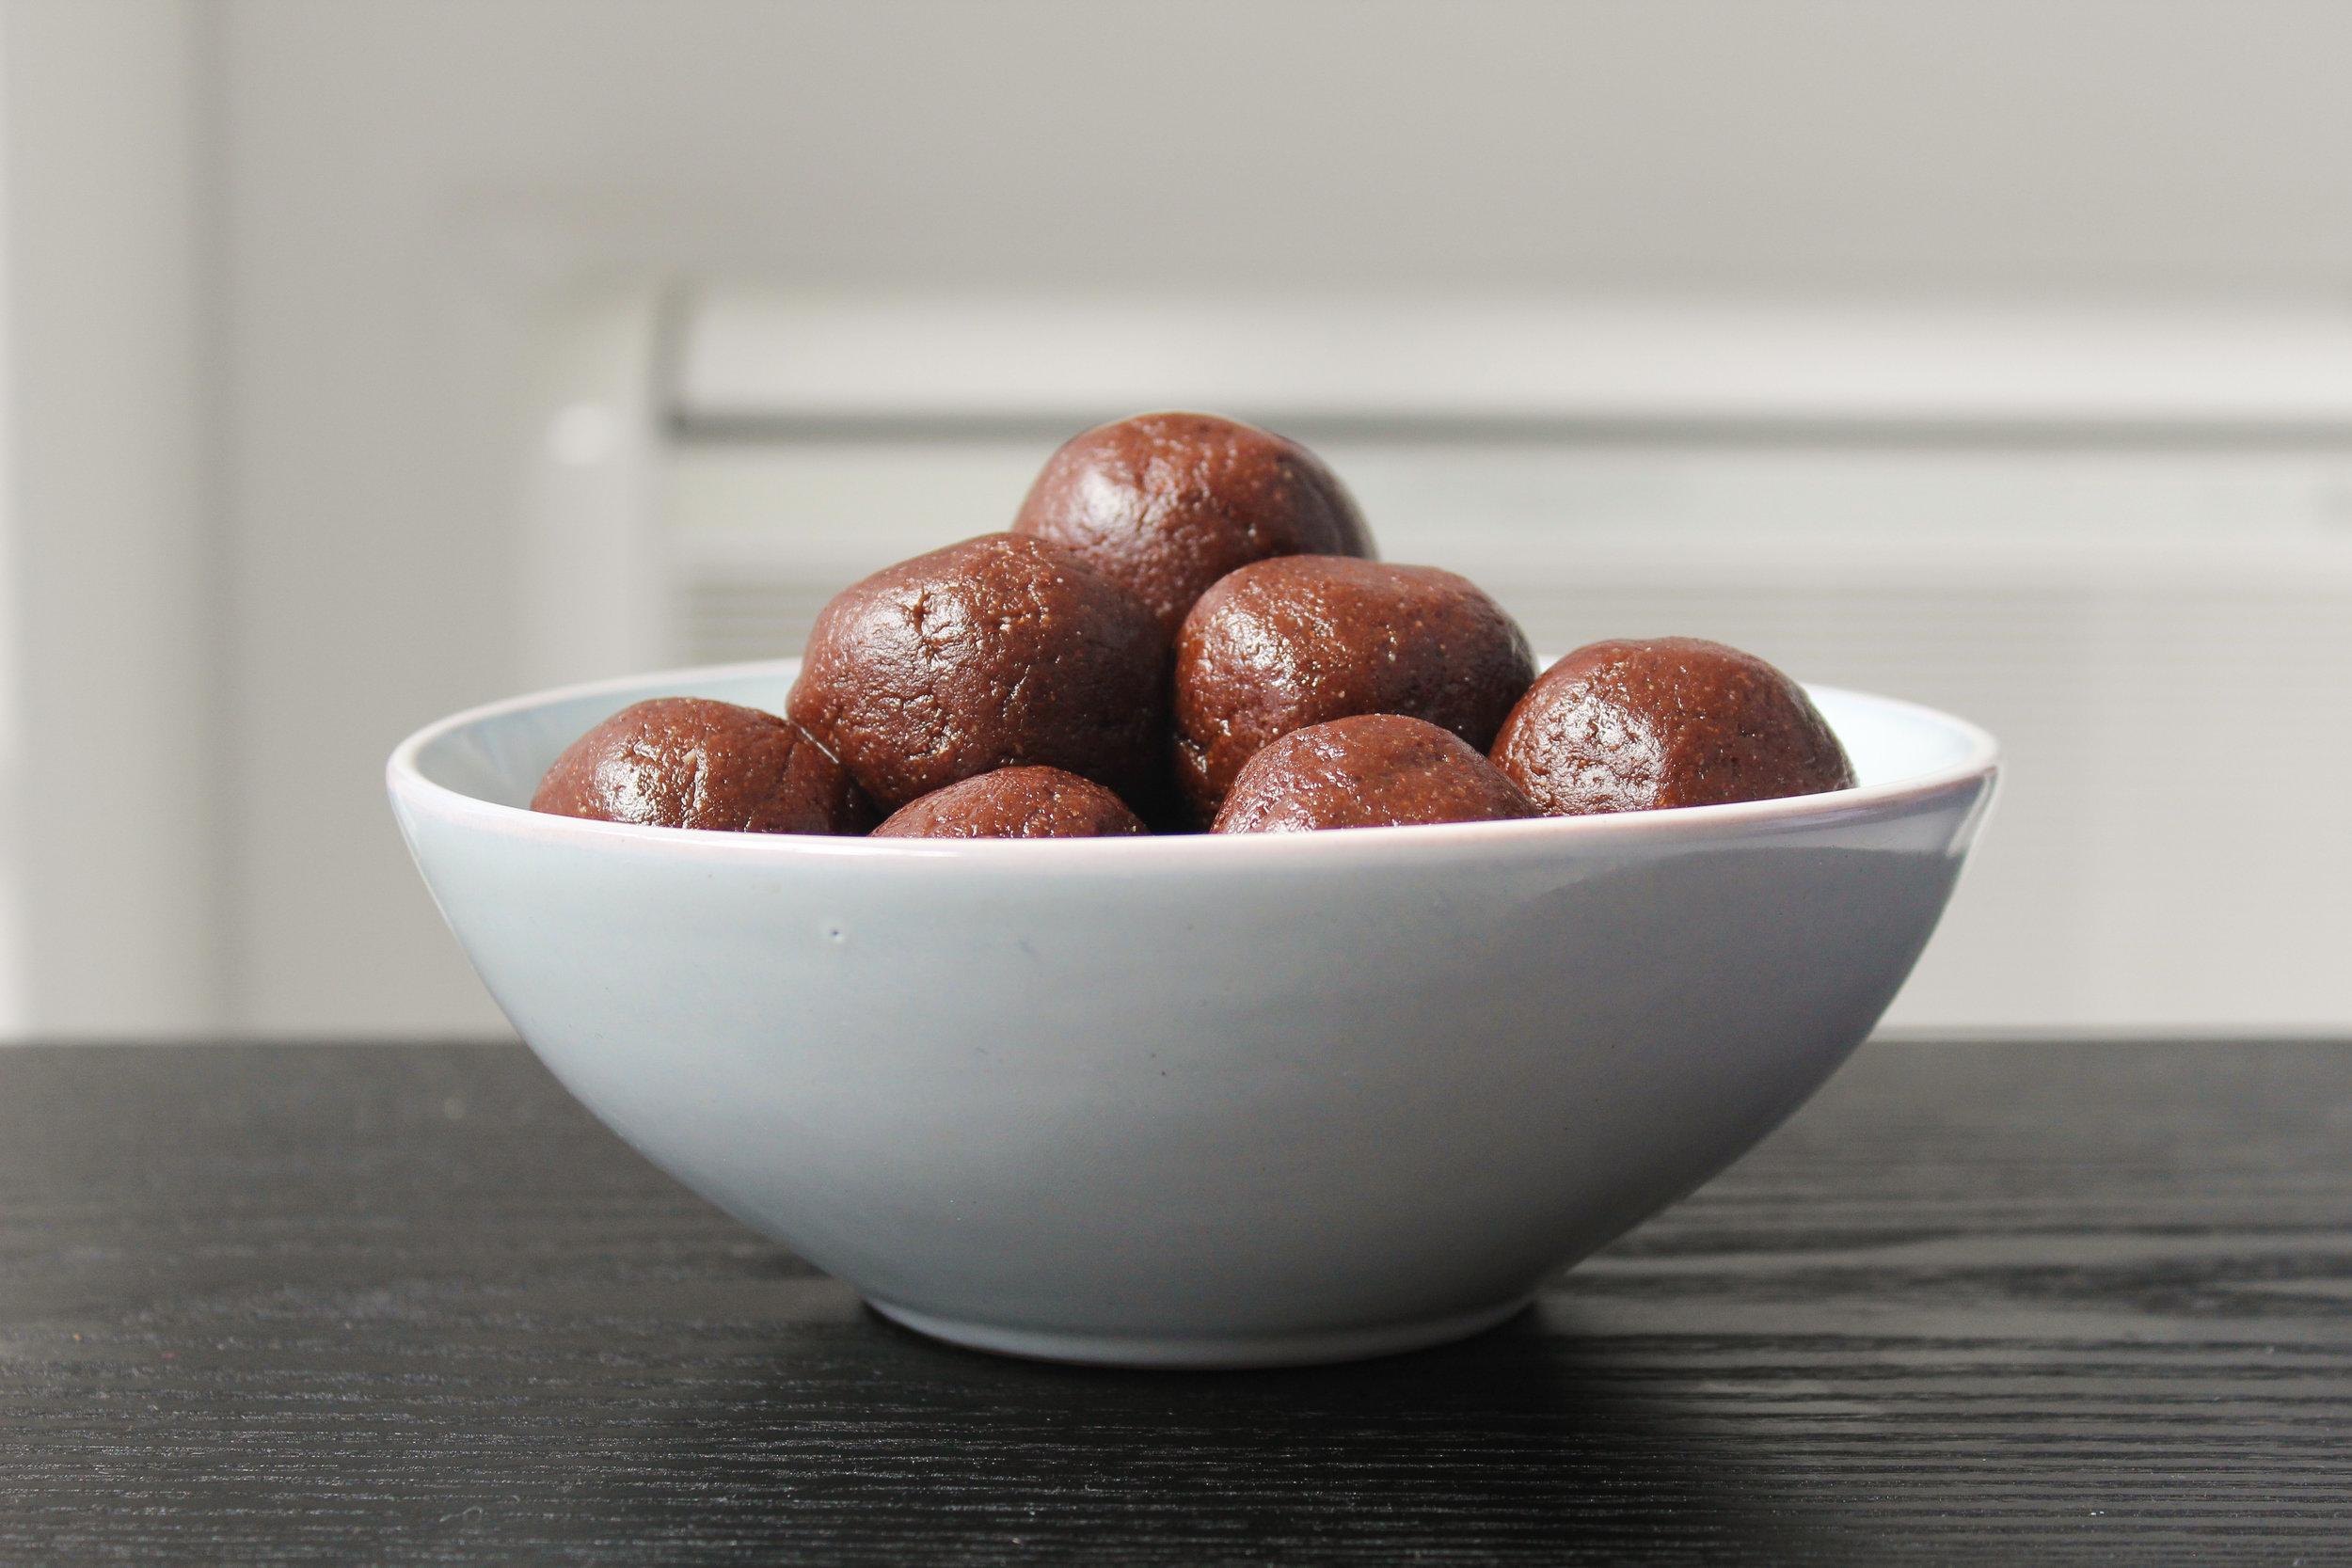 ALMOND FUDGE ENERGY BALLS |vegan, dairy free, gluten free, egg free, healthy  , easy, plant based  , refined sugar free, bliss balls, recoveringraw.com, recovering raw